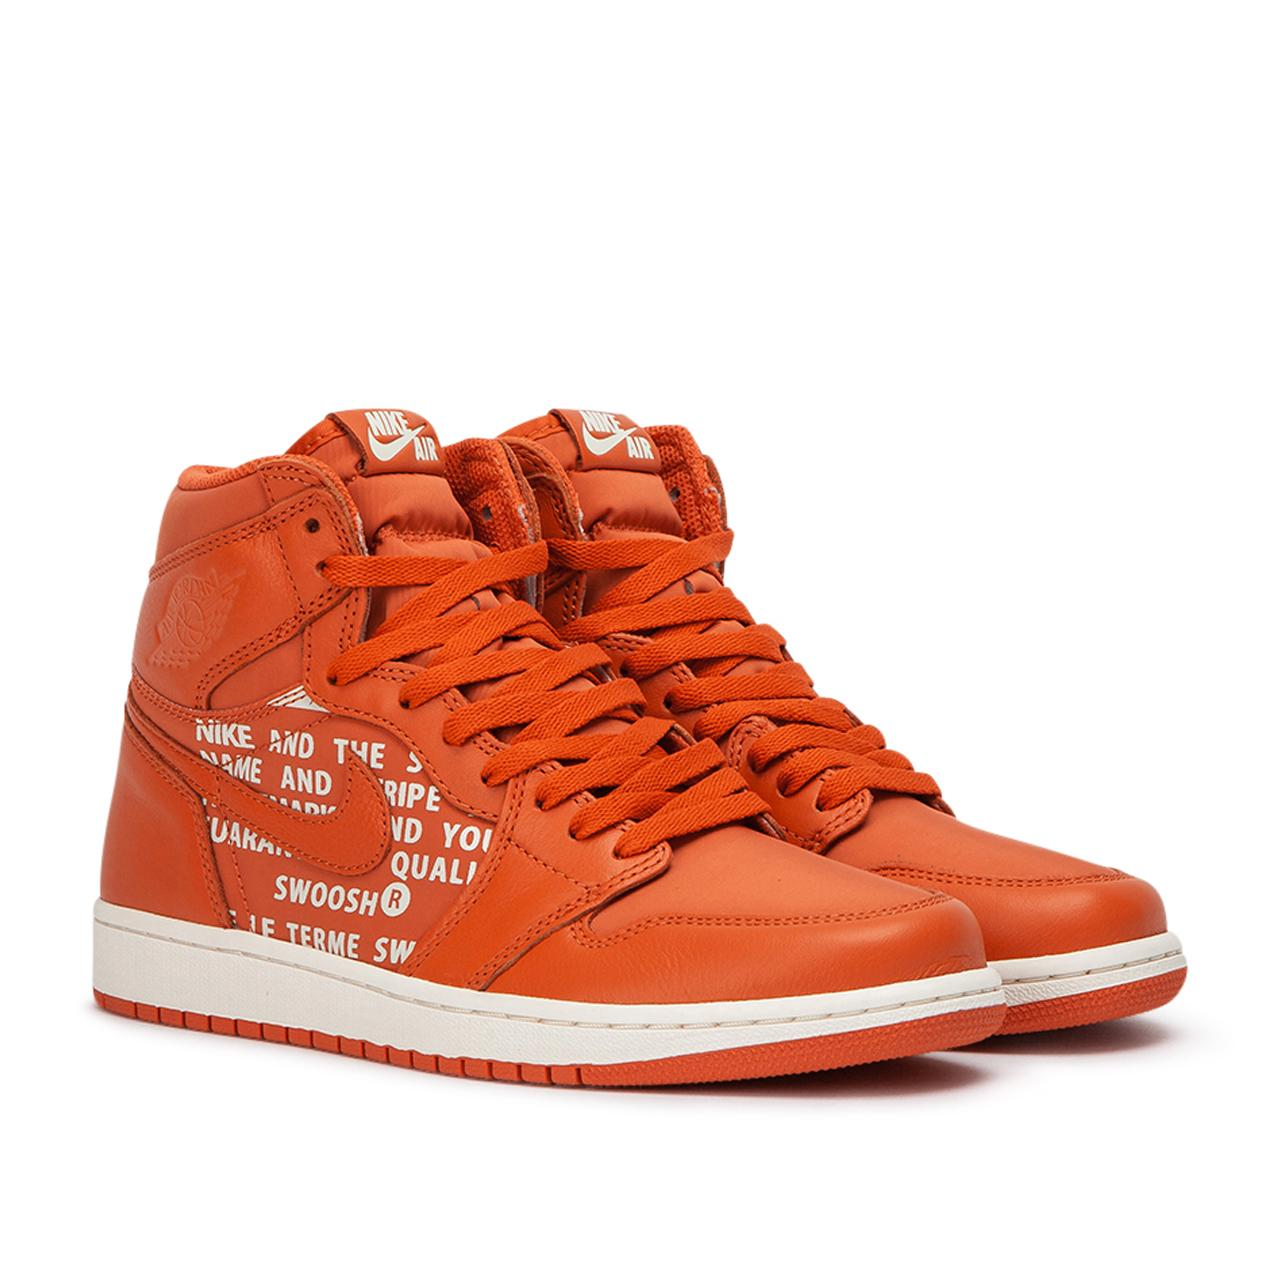 Nike Leather Air Jordan 1 Retro High Og